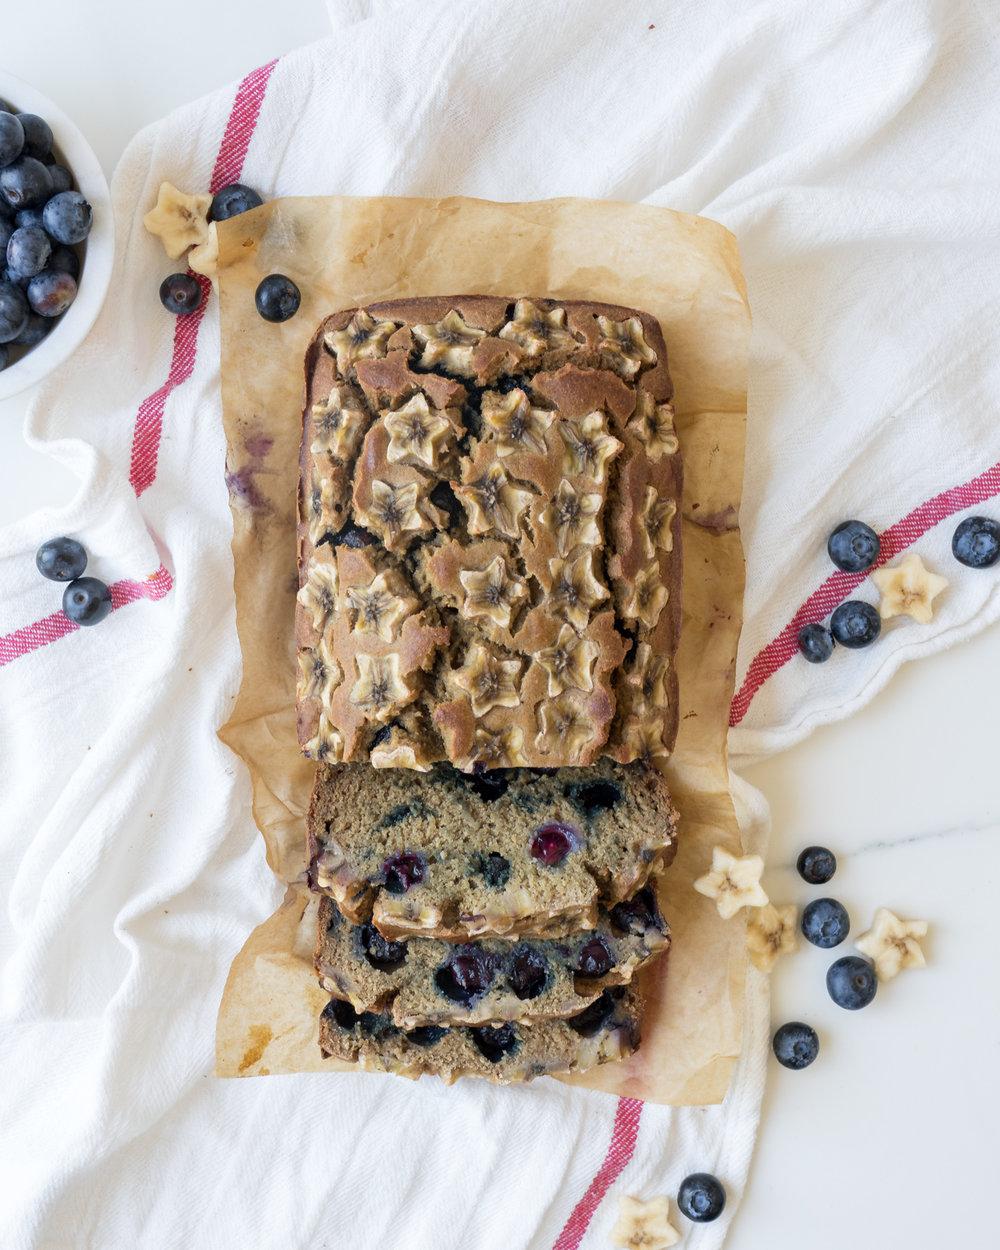 Star-Spangled Blueberry Banana Bread, Brunchographers